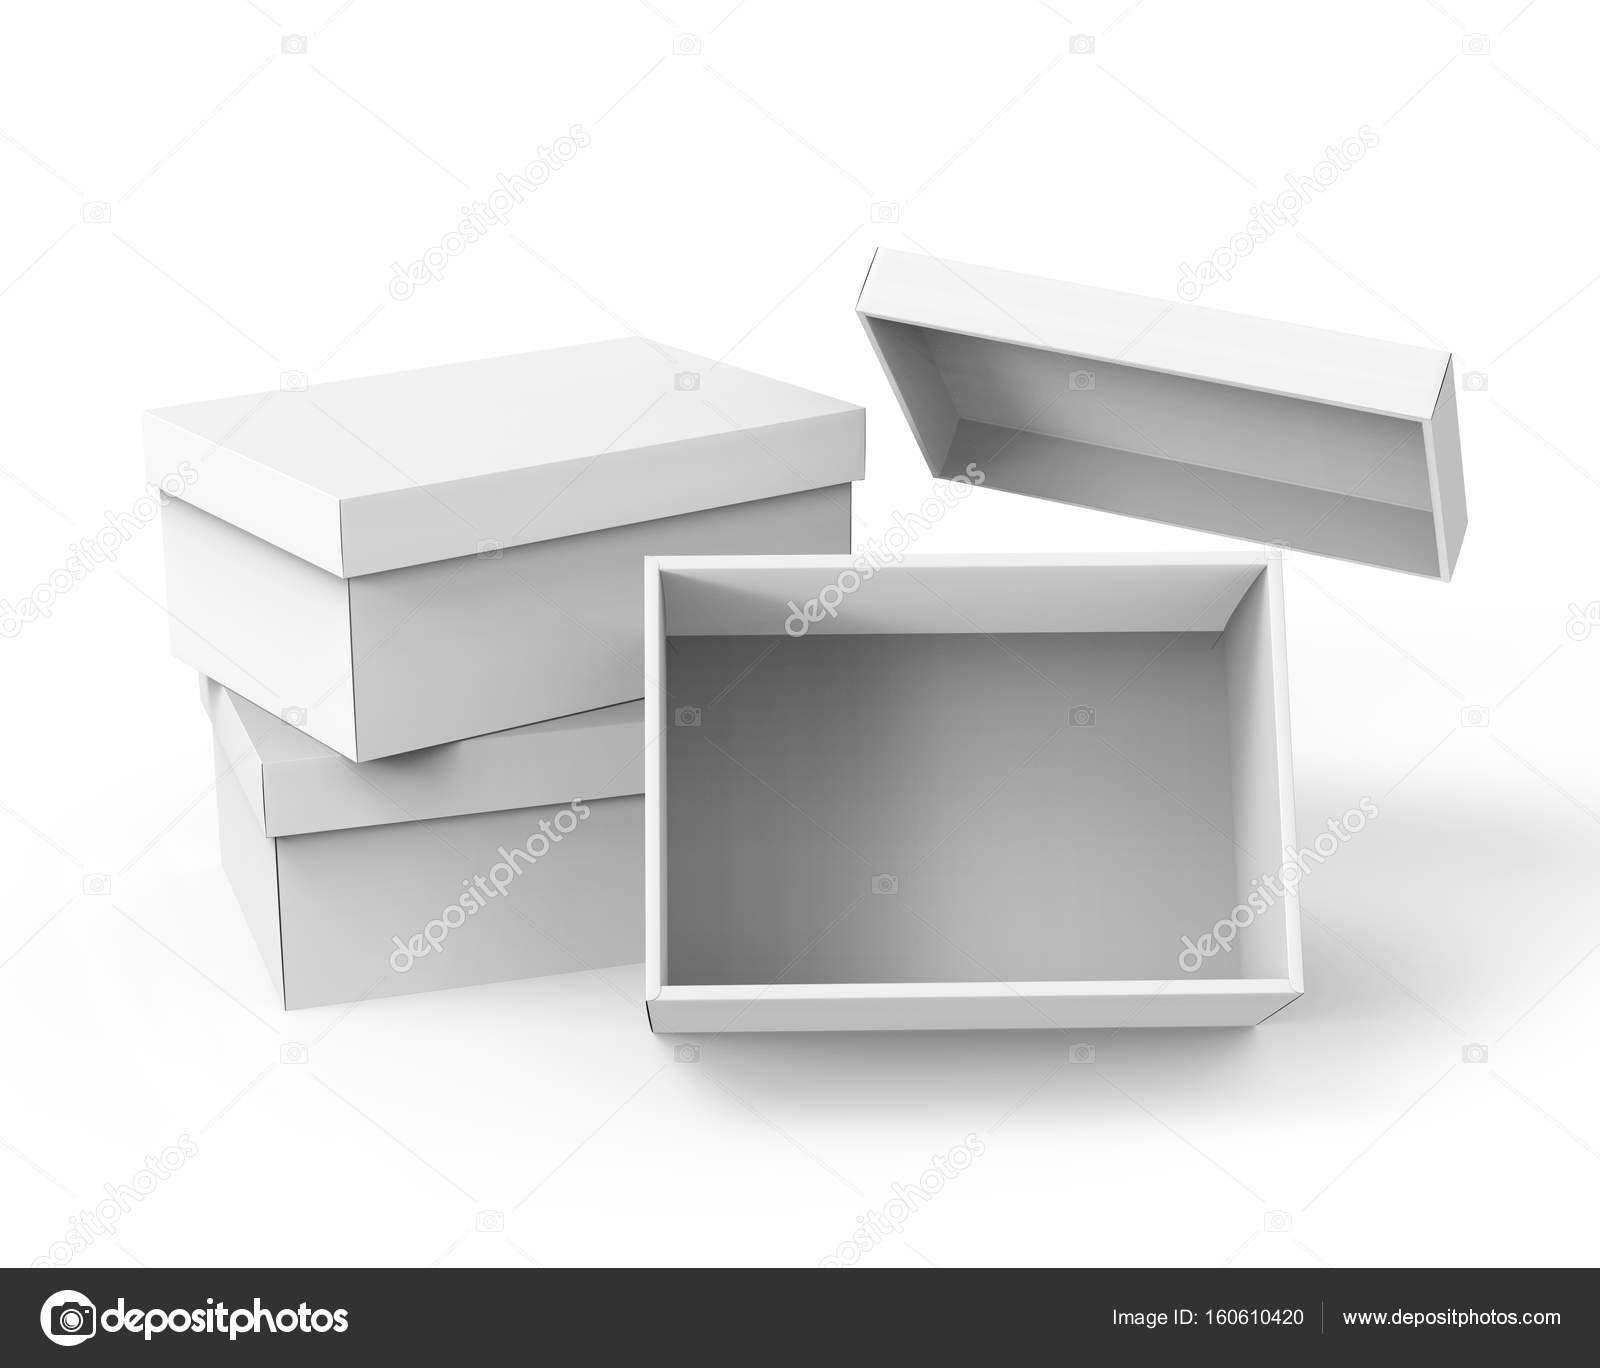 Blank paper box template stock photo kchungtw 160610420 blank paper box template stock photo maxwellsz